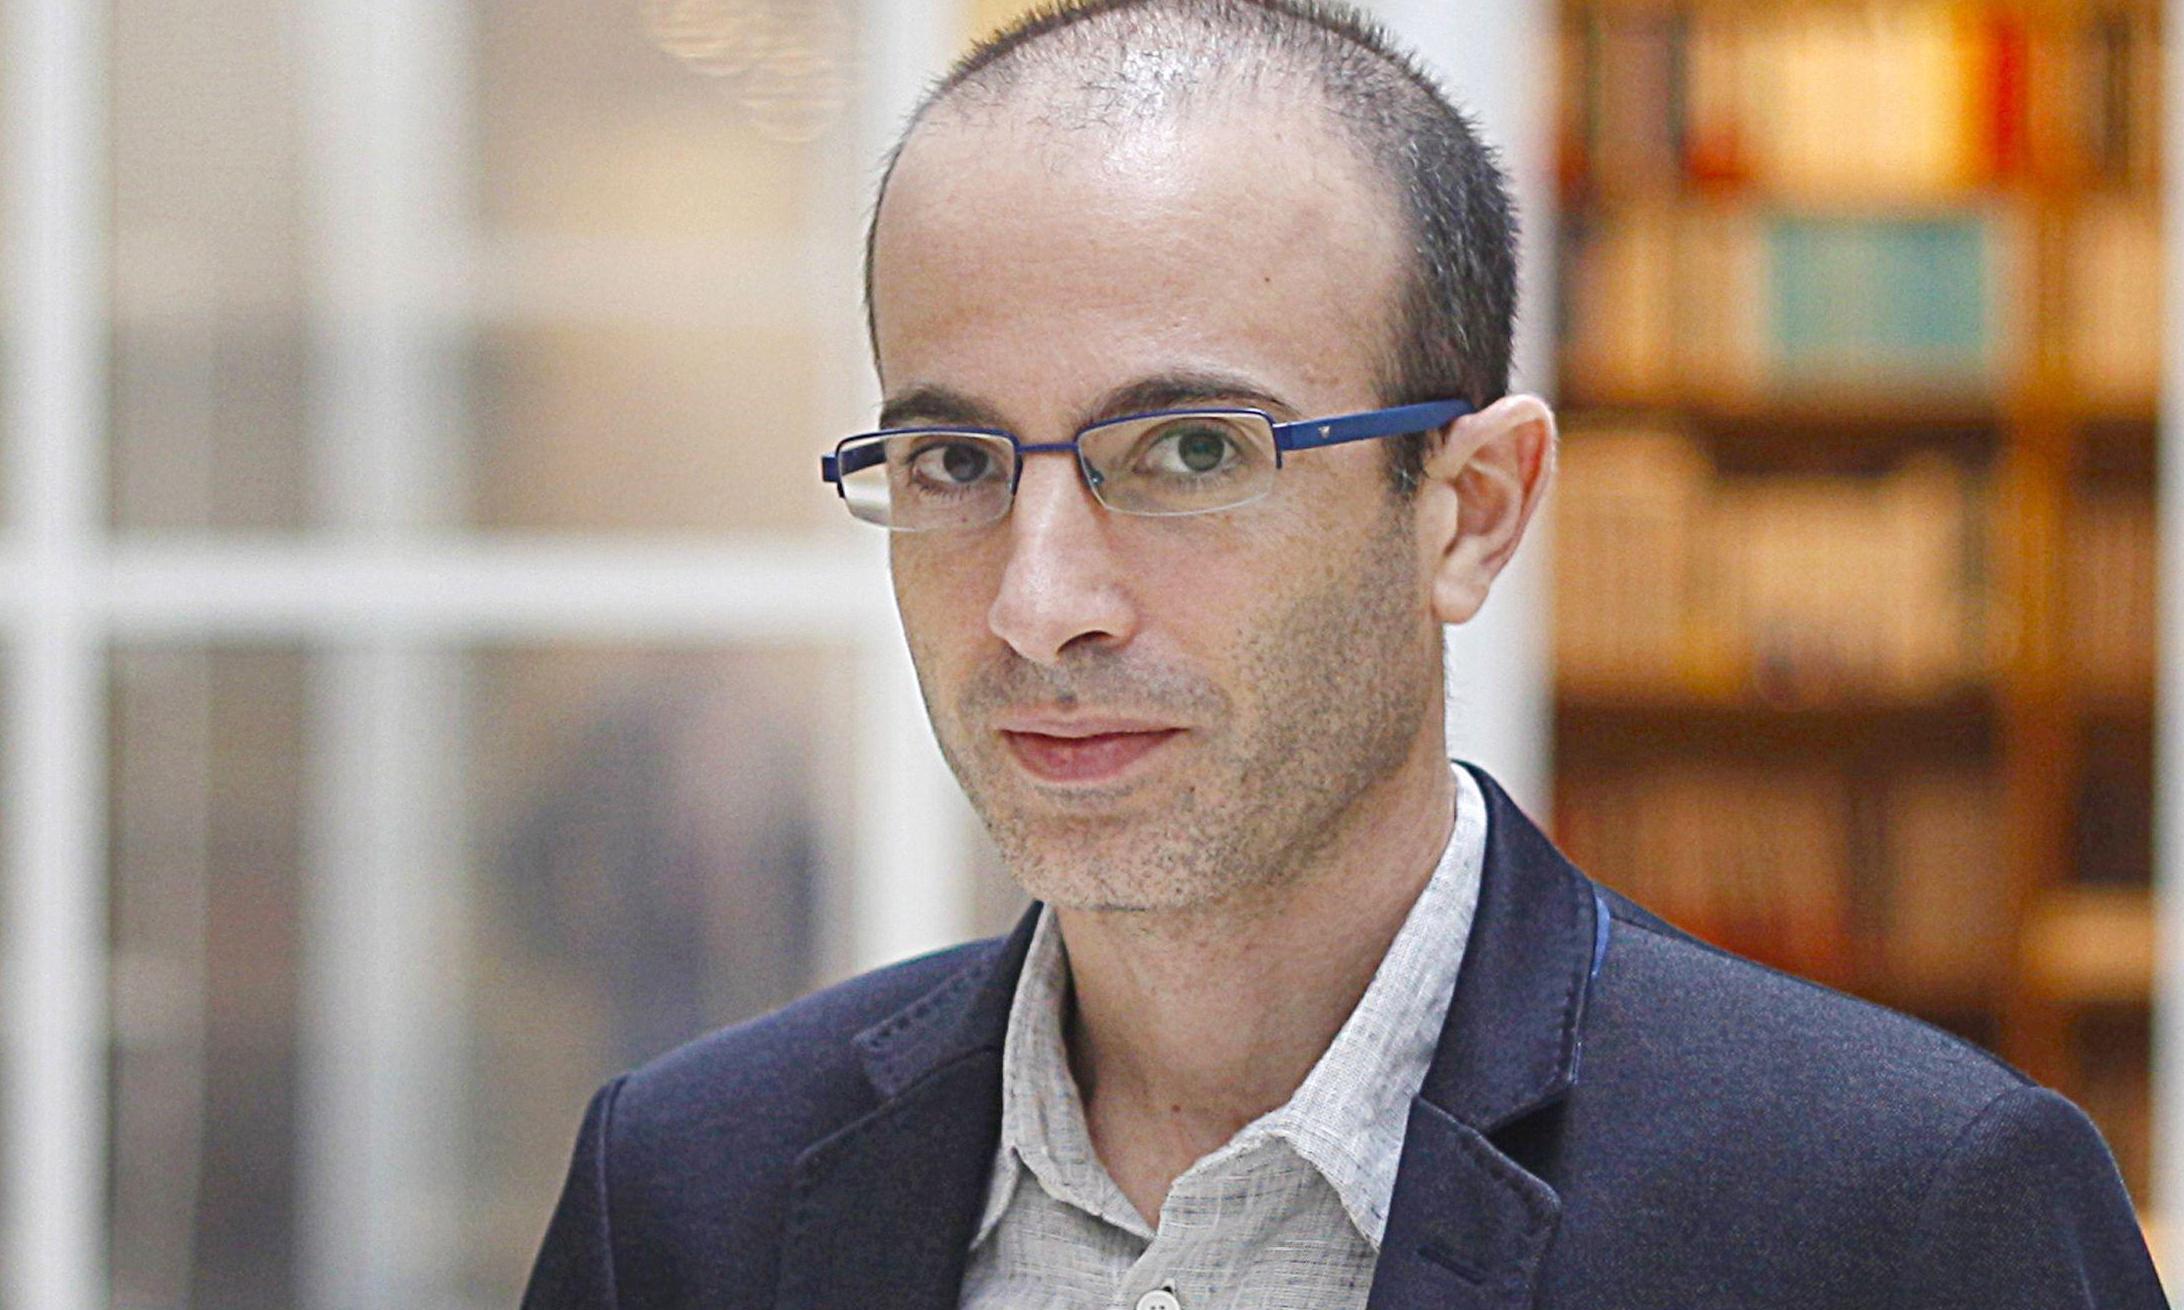 Yuval Noah Harari warns Trump that patriotism cannot solve global threats